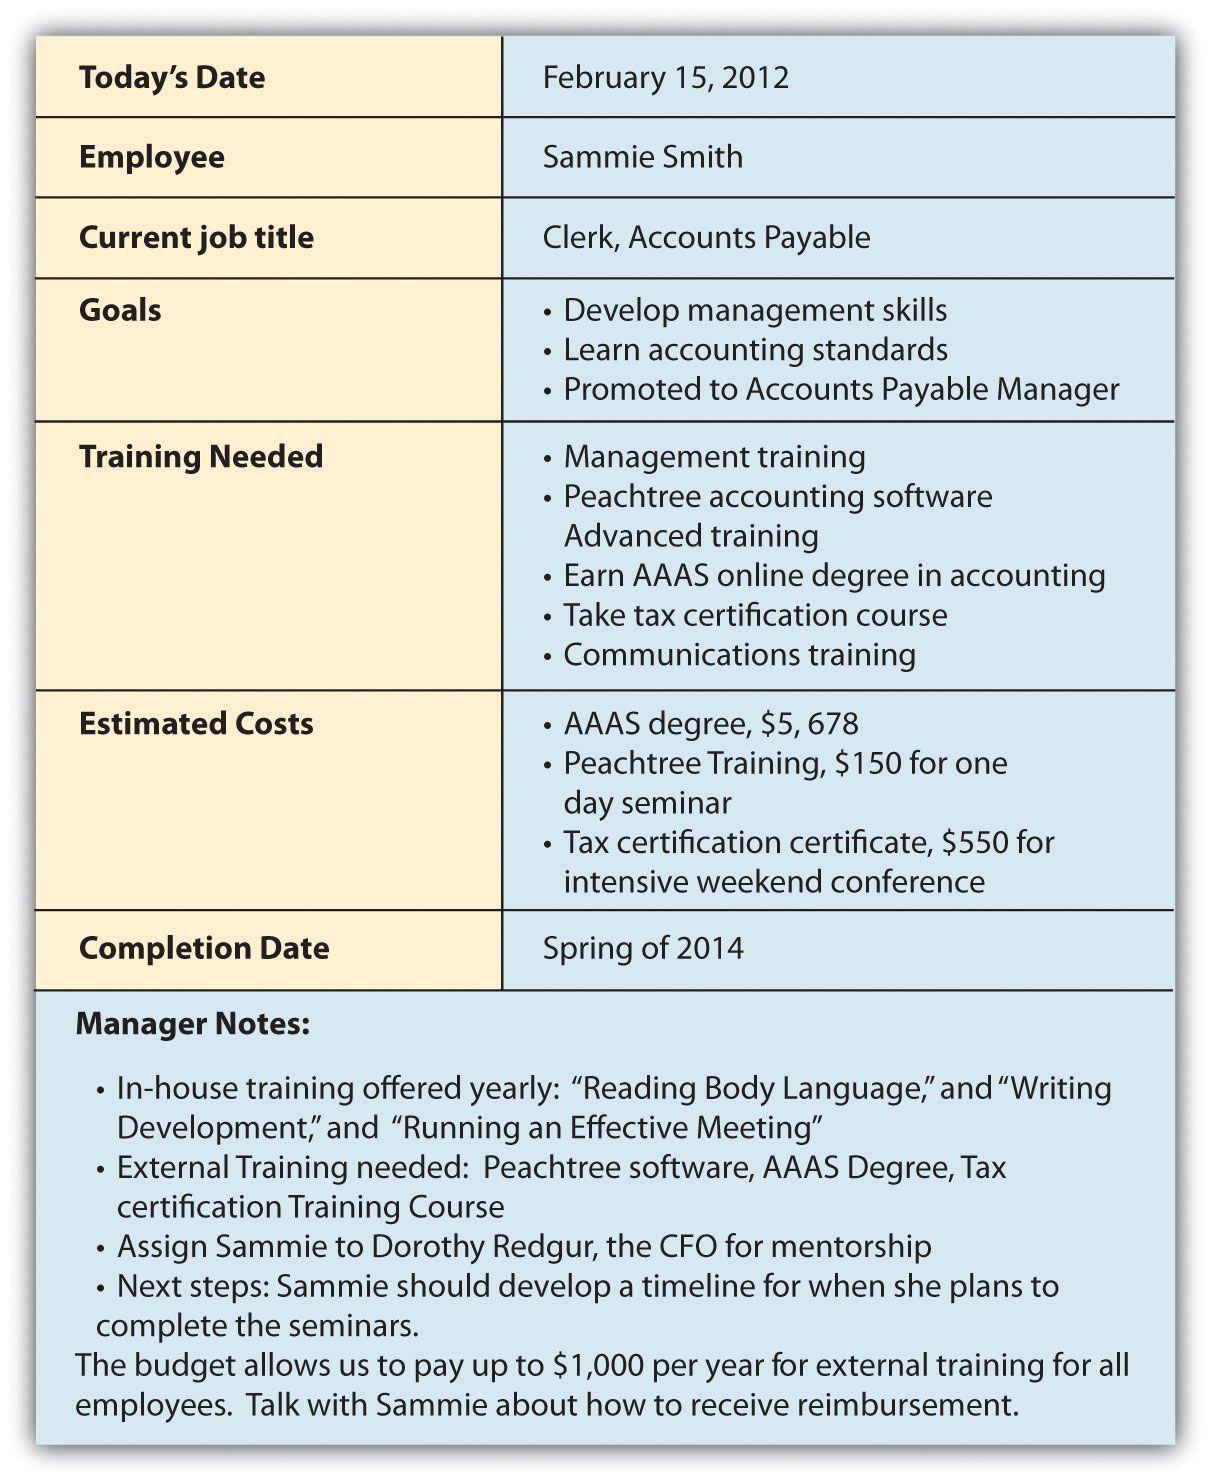 006 Astounding Employee Development Action Plan Example Concept  ExamplesFull